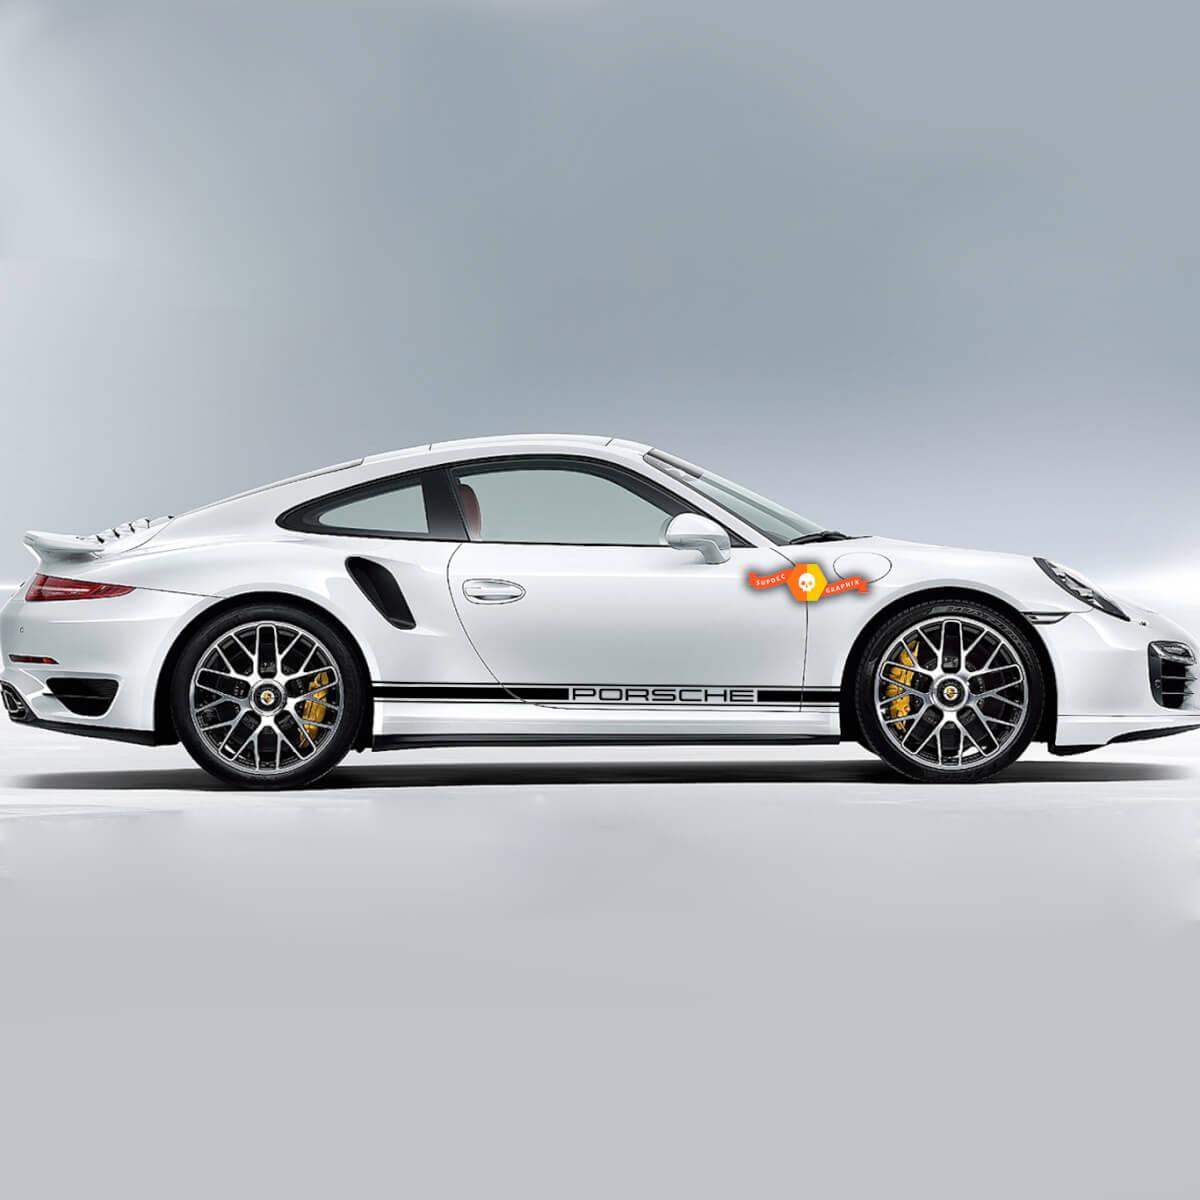 Porsche One Color Side Stripes Side stripes one color Or Any Porsche